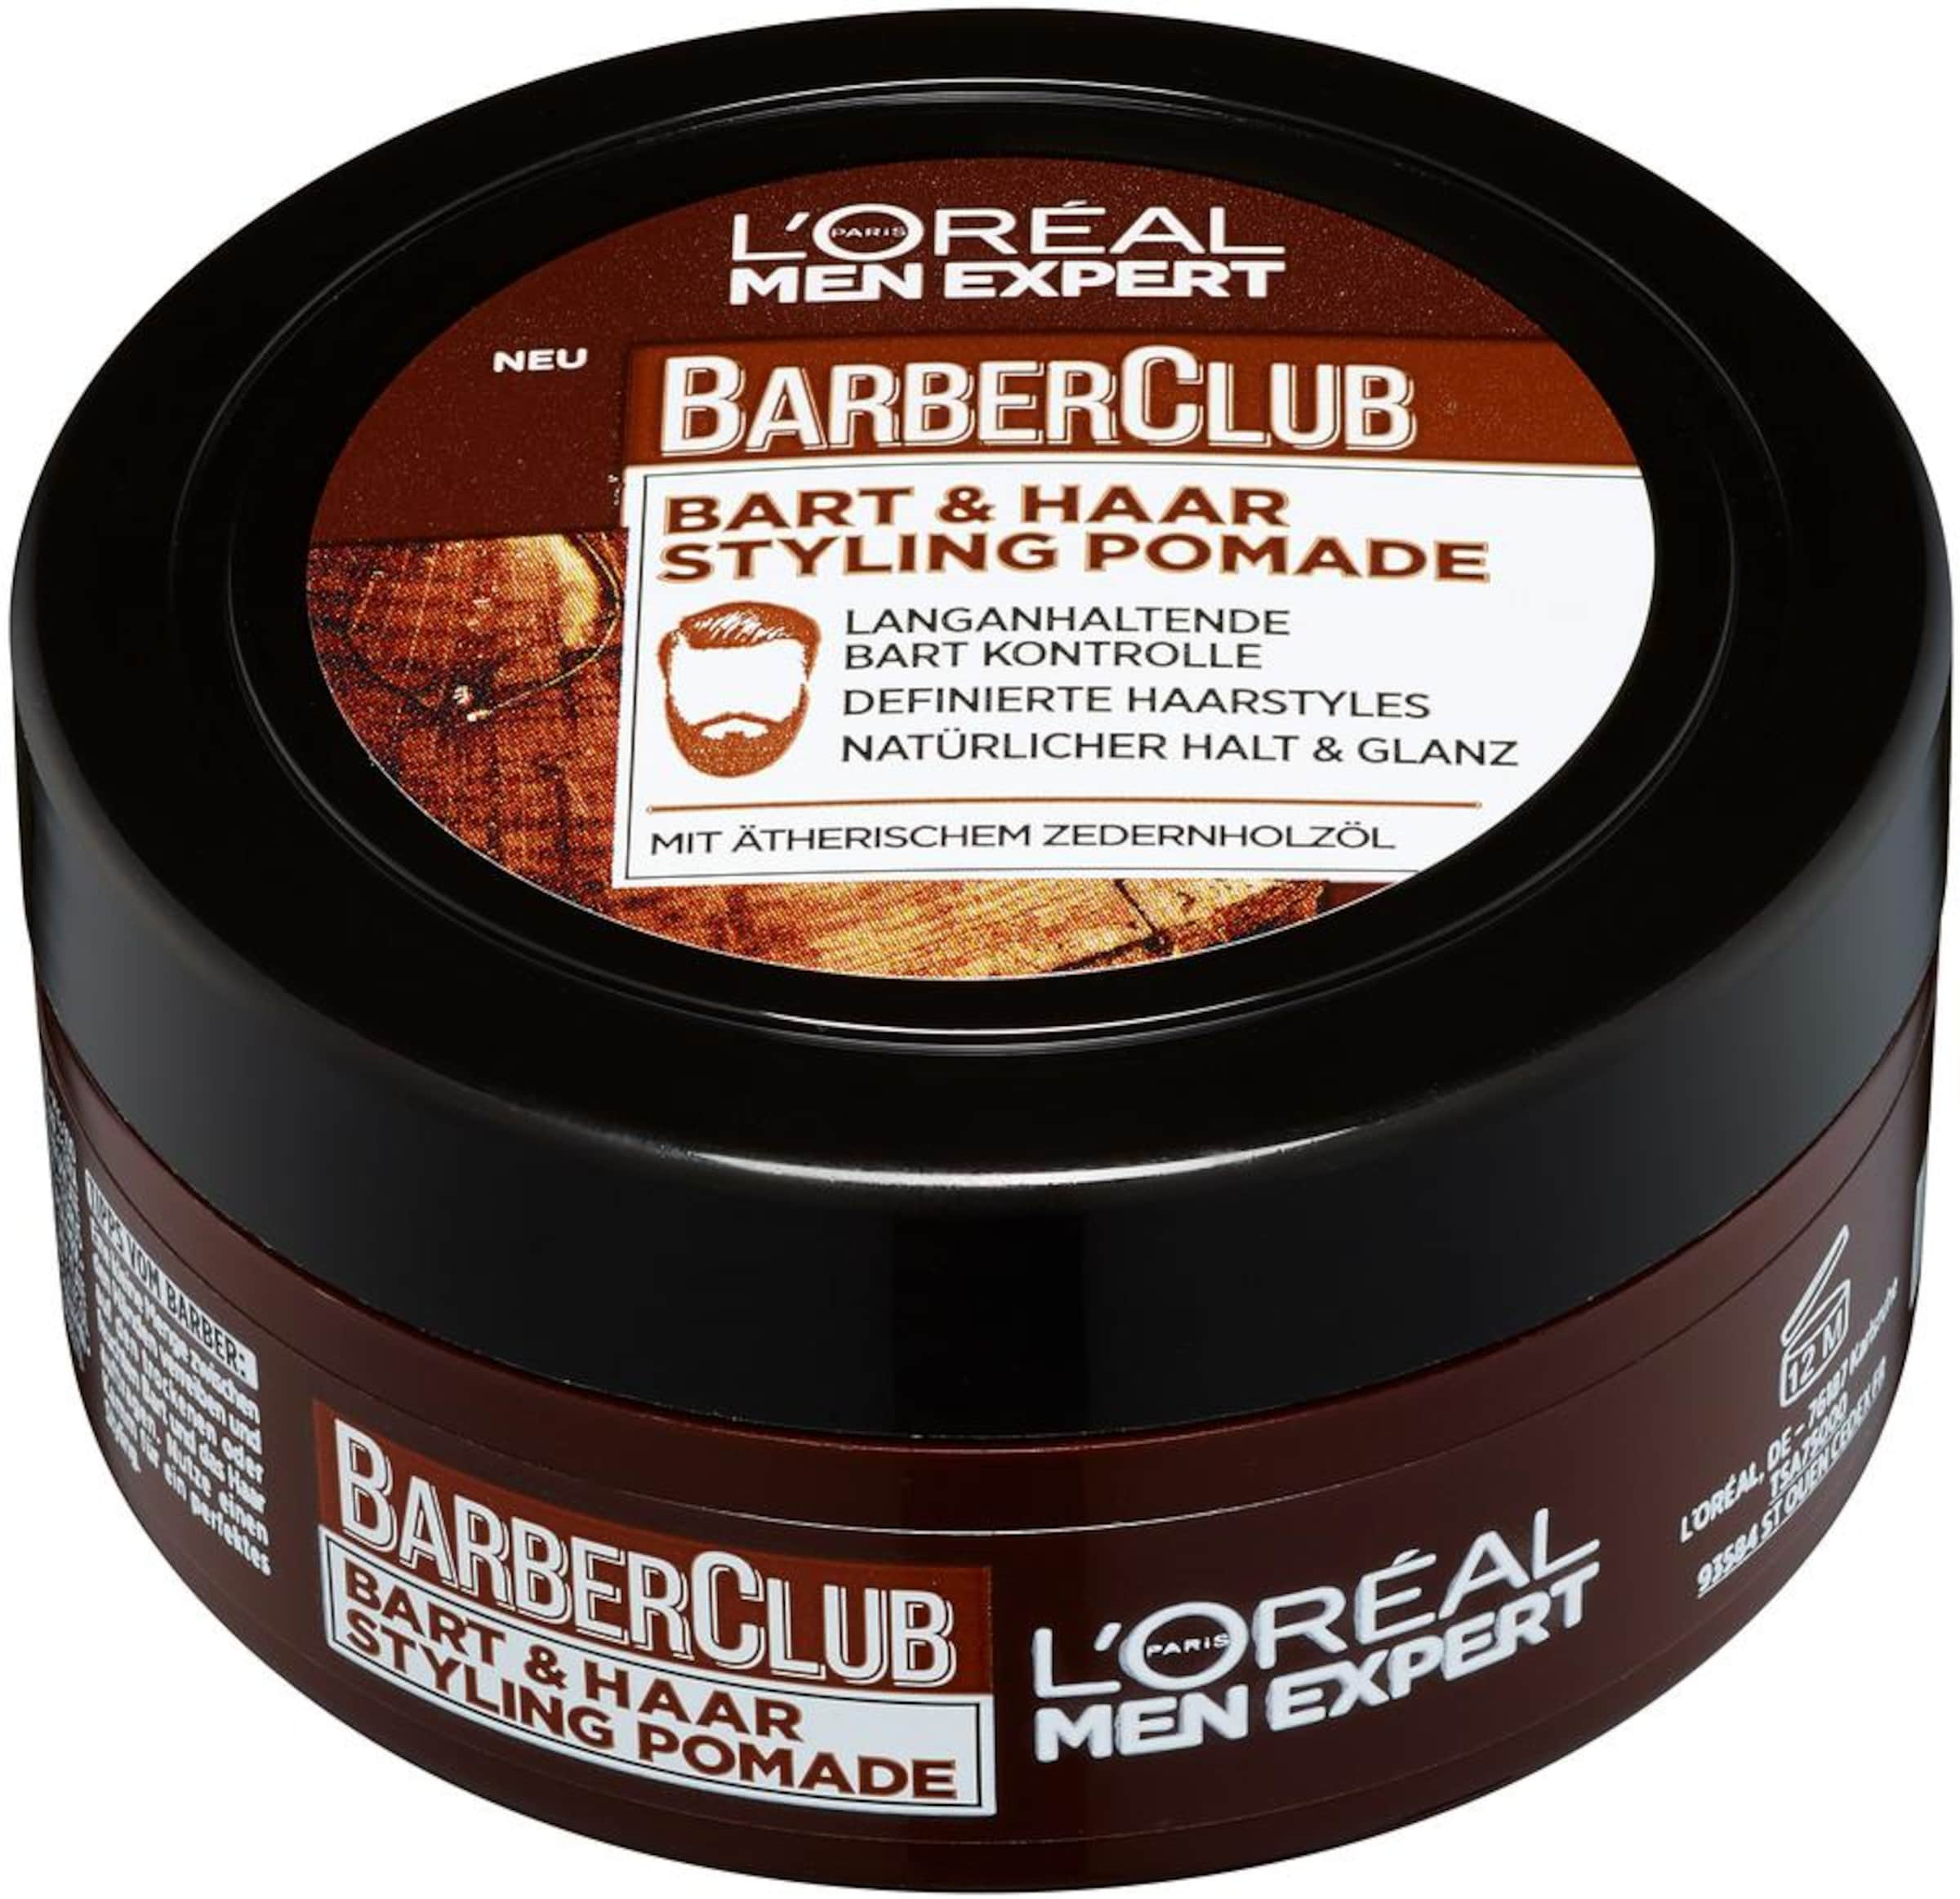 L'Oréal Paris men expert 'Barber Club Bart und Haar Styling Pomade', Bartstyling